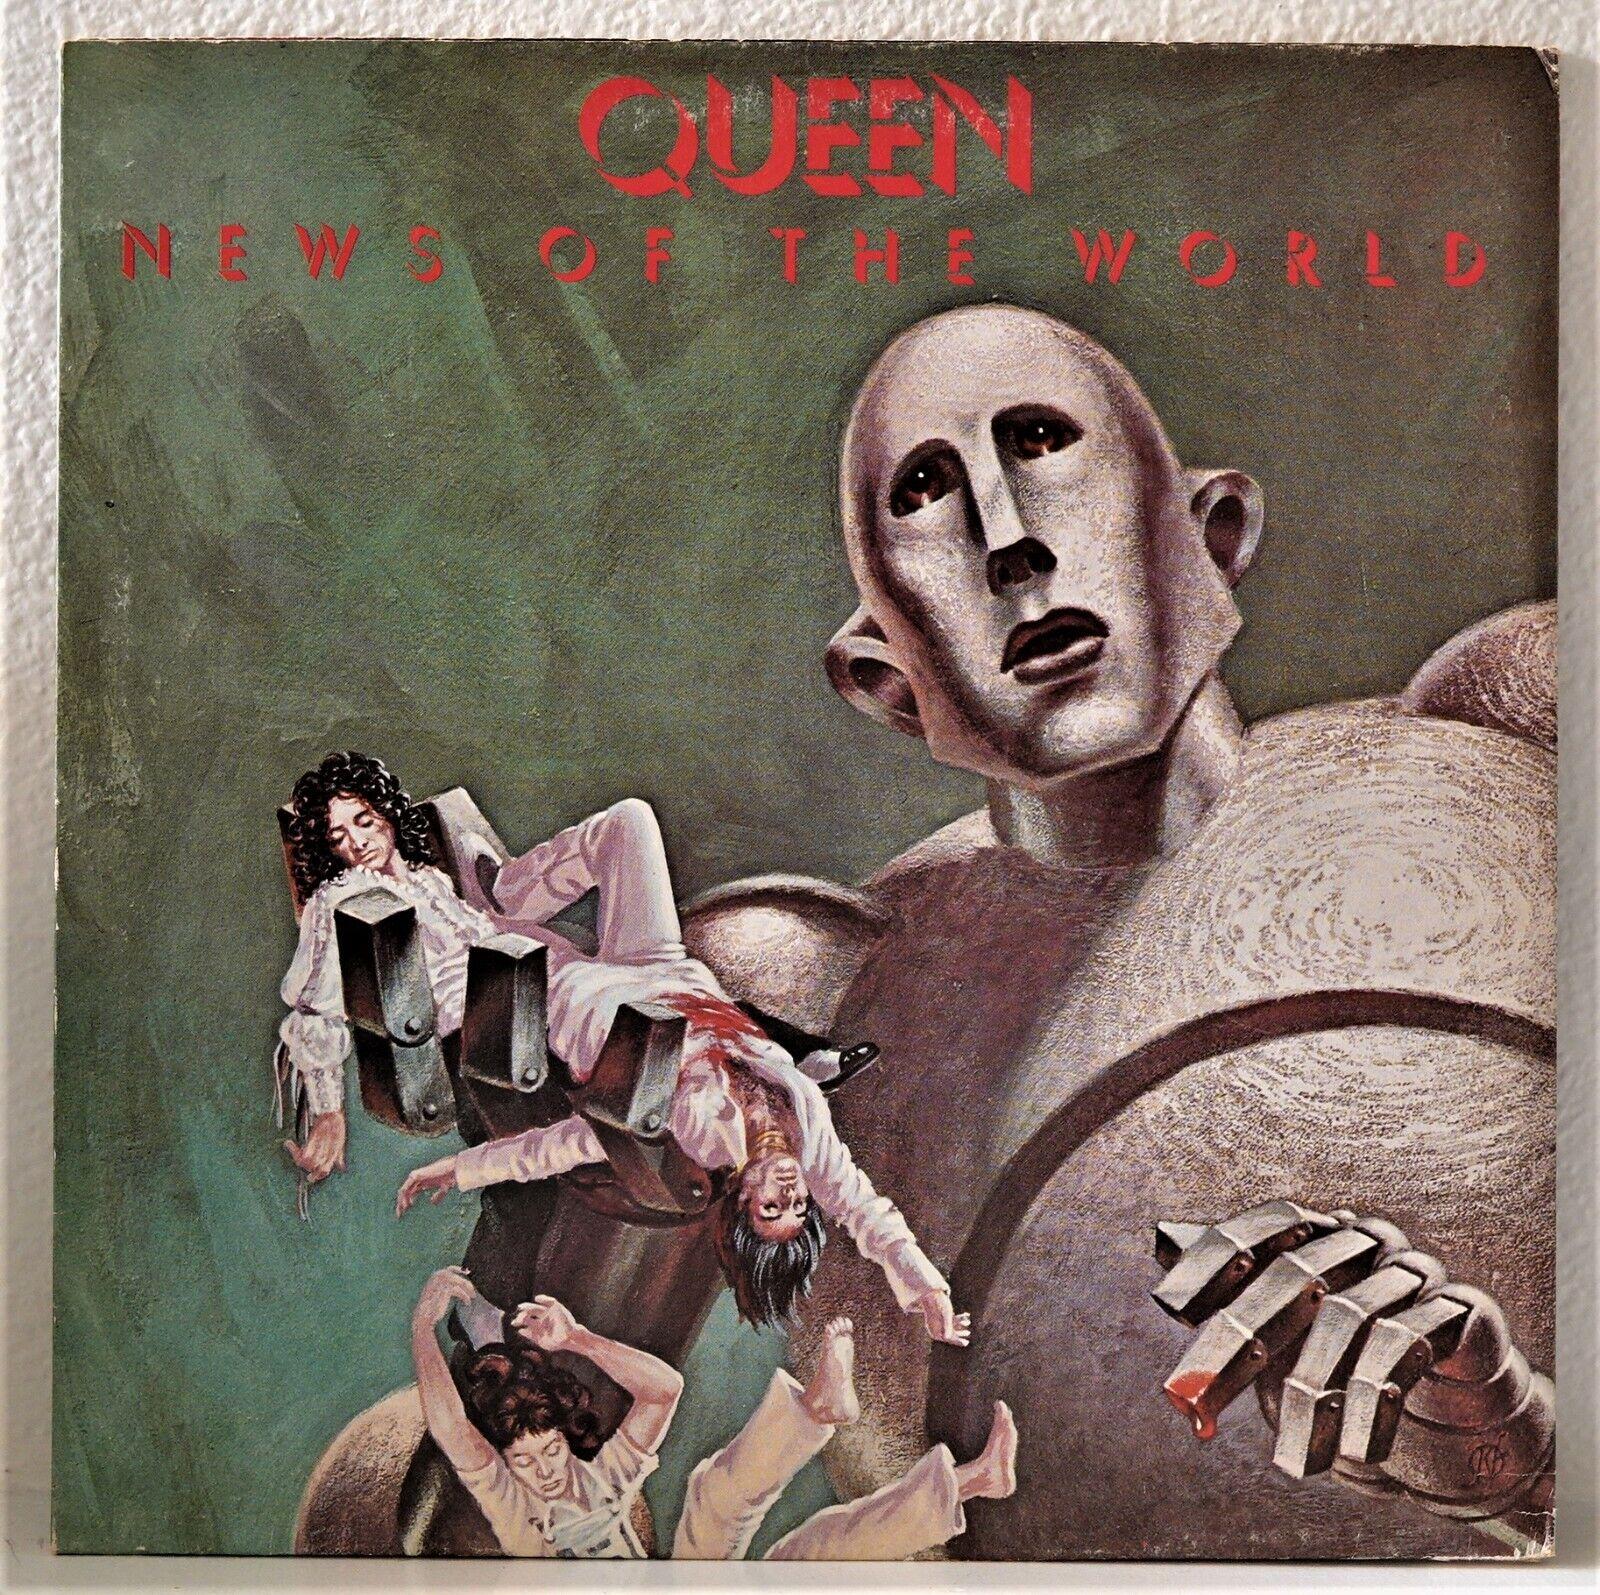 Queen - News Of The World Vinyl LP UK First Pressing 1977 EX Vinyl  - $28.00